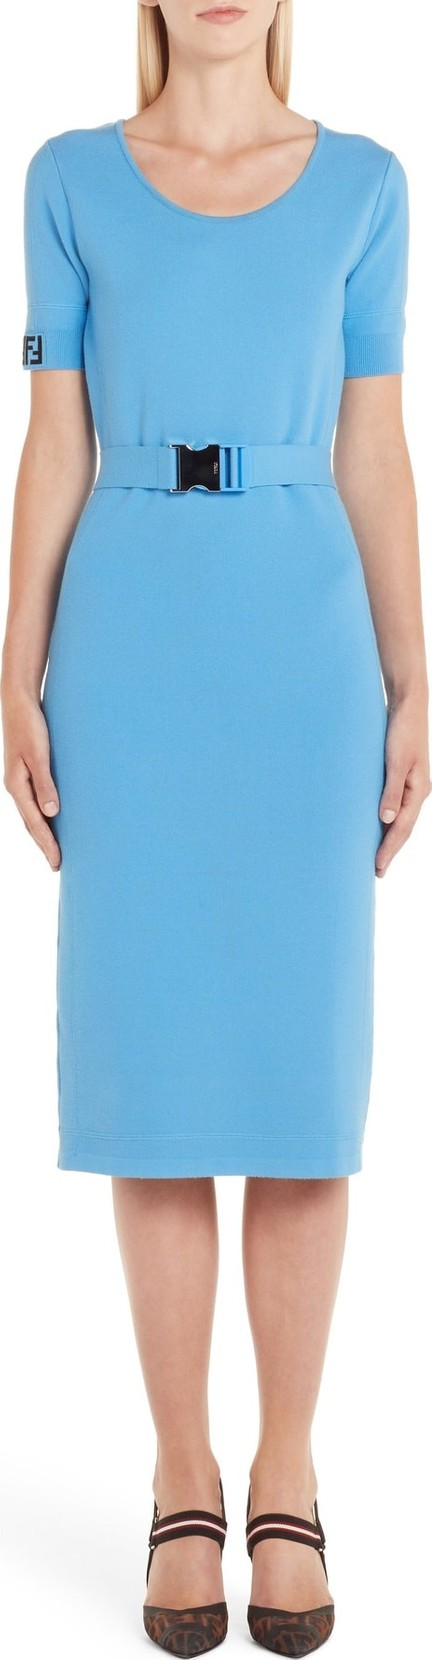 Fendi Belted Logo Dress